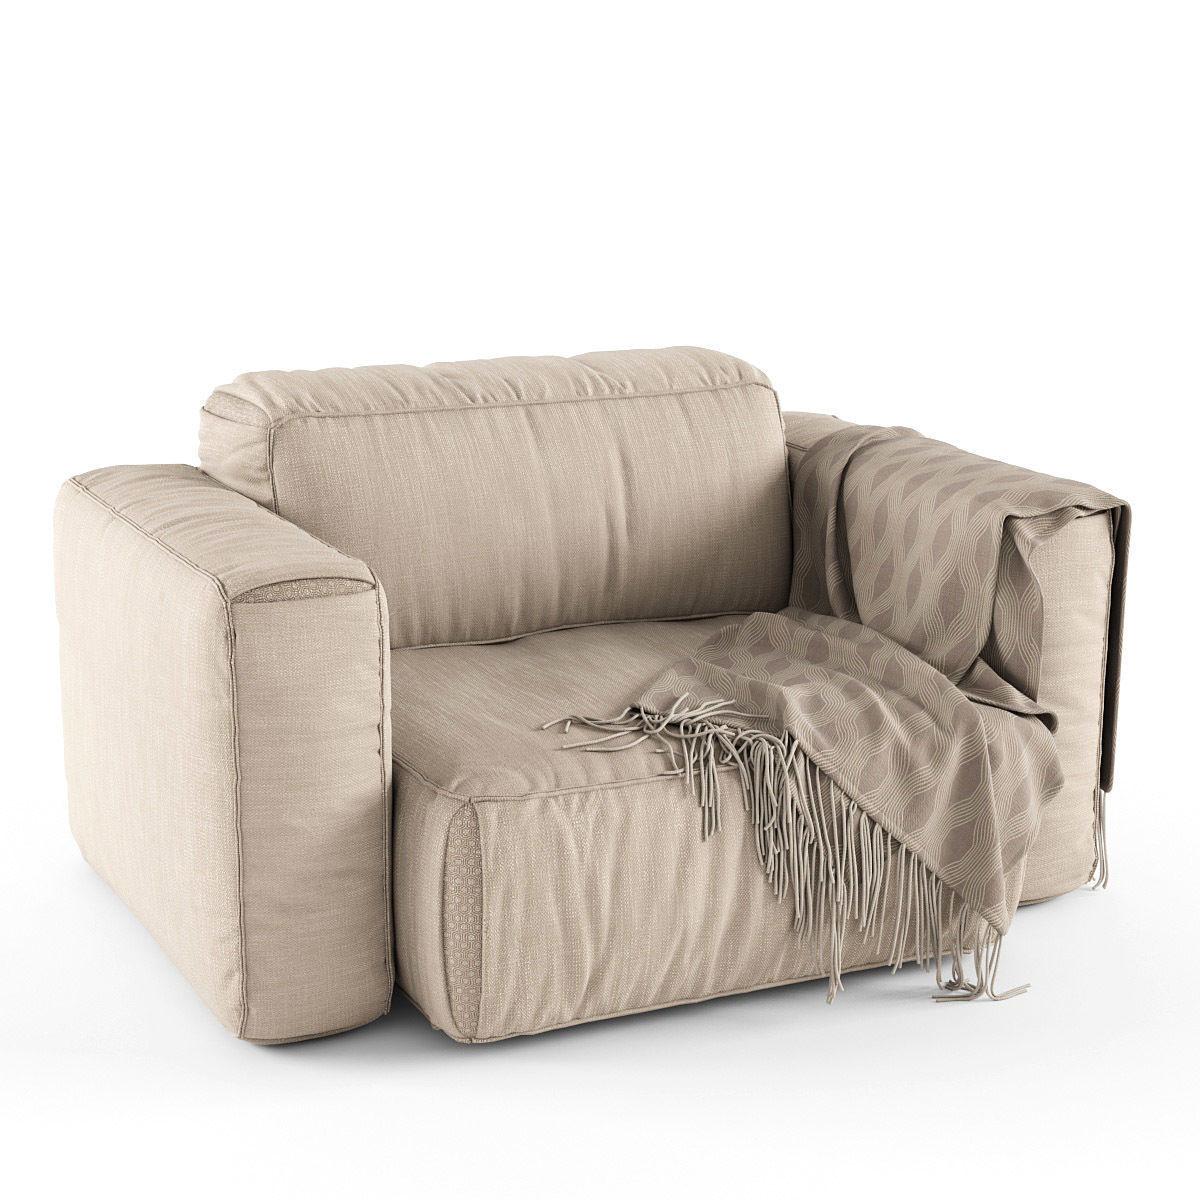 Koo International SOFT Chair